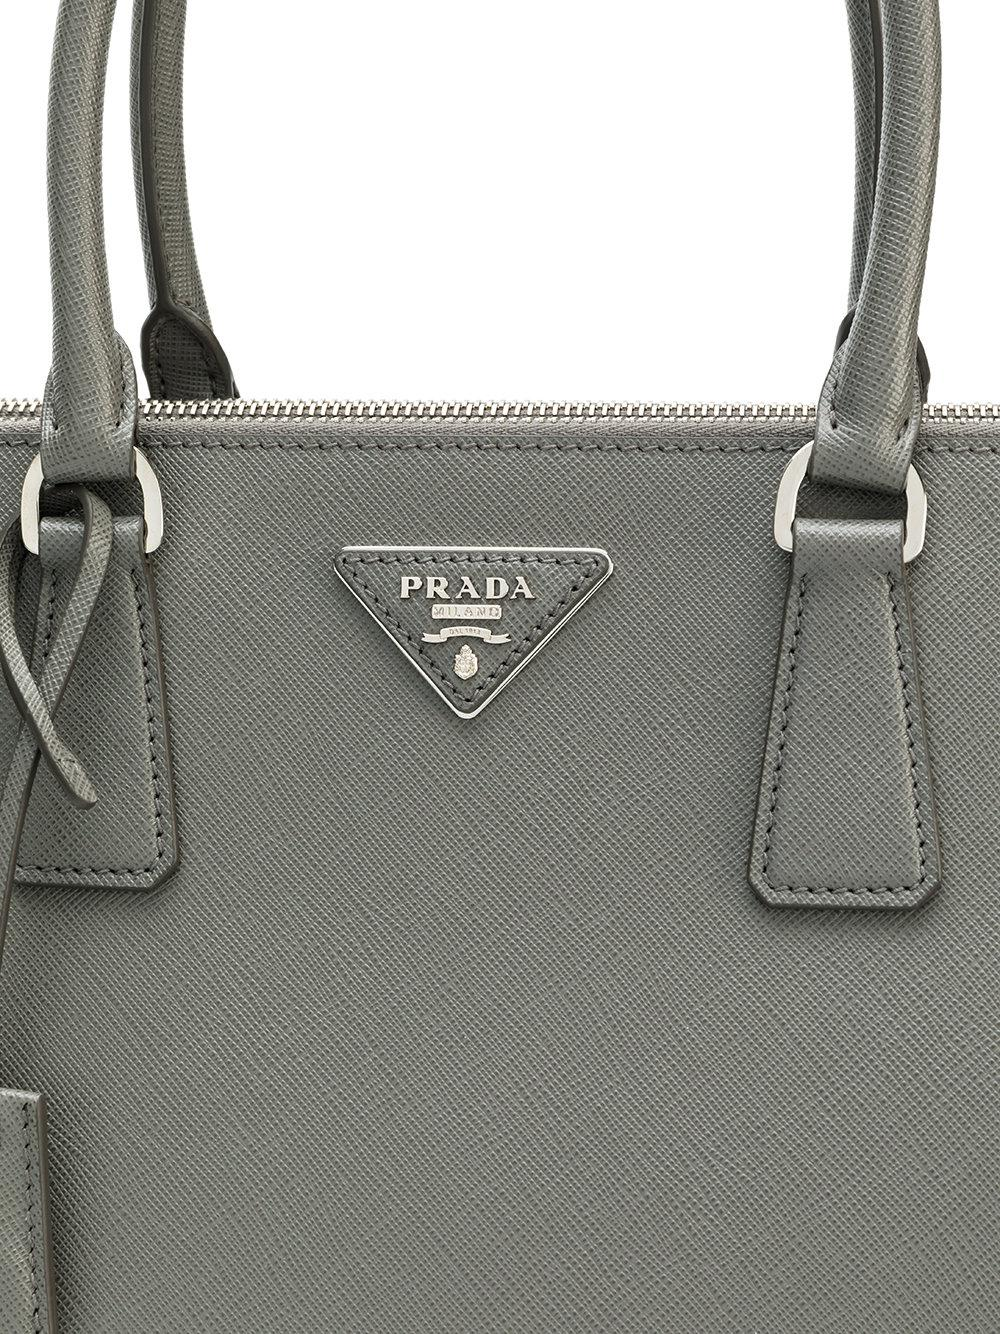 f6d3463fa6d3 ... low cost france lyst prada galleria large tote bag in gray c05b2 bf905  1f698 989ea